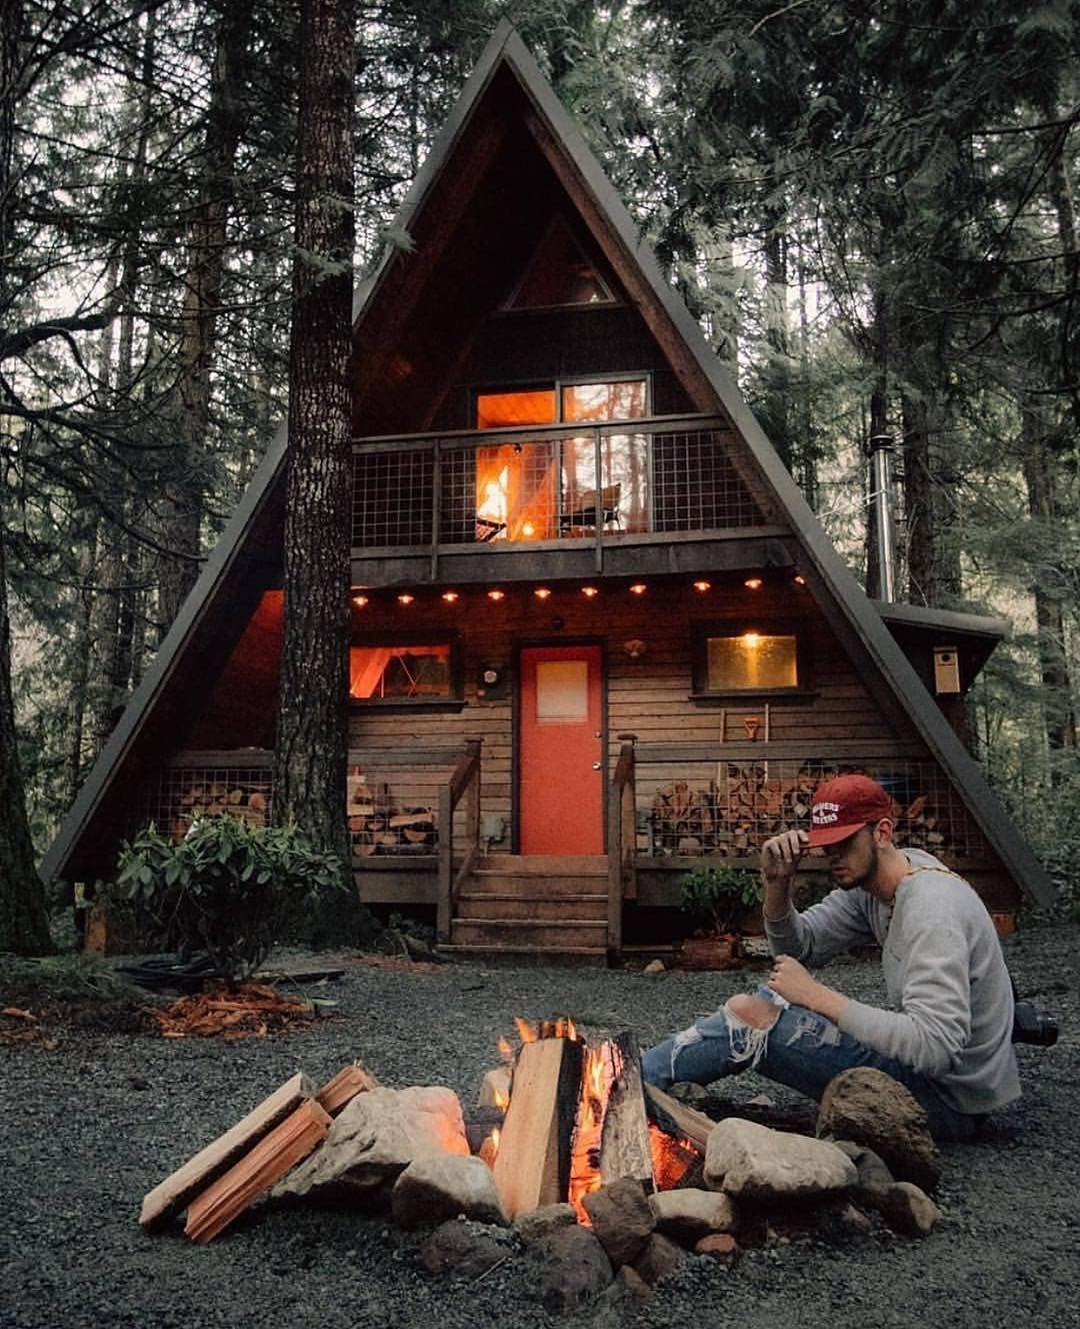 Nature On Instagram Cabin Getaway Anyone Mount Rainier National Park Washington Photo By Karavannnnn Na A Frame House Small Log Cabin Log Cabin Homes